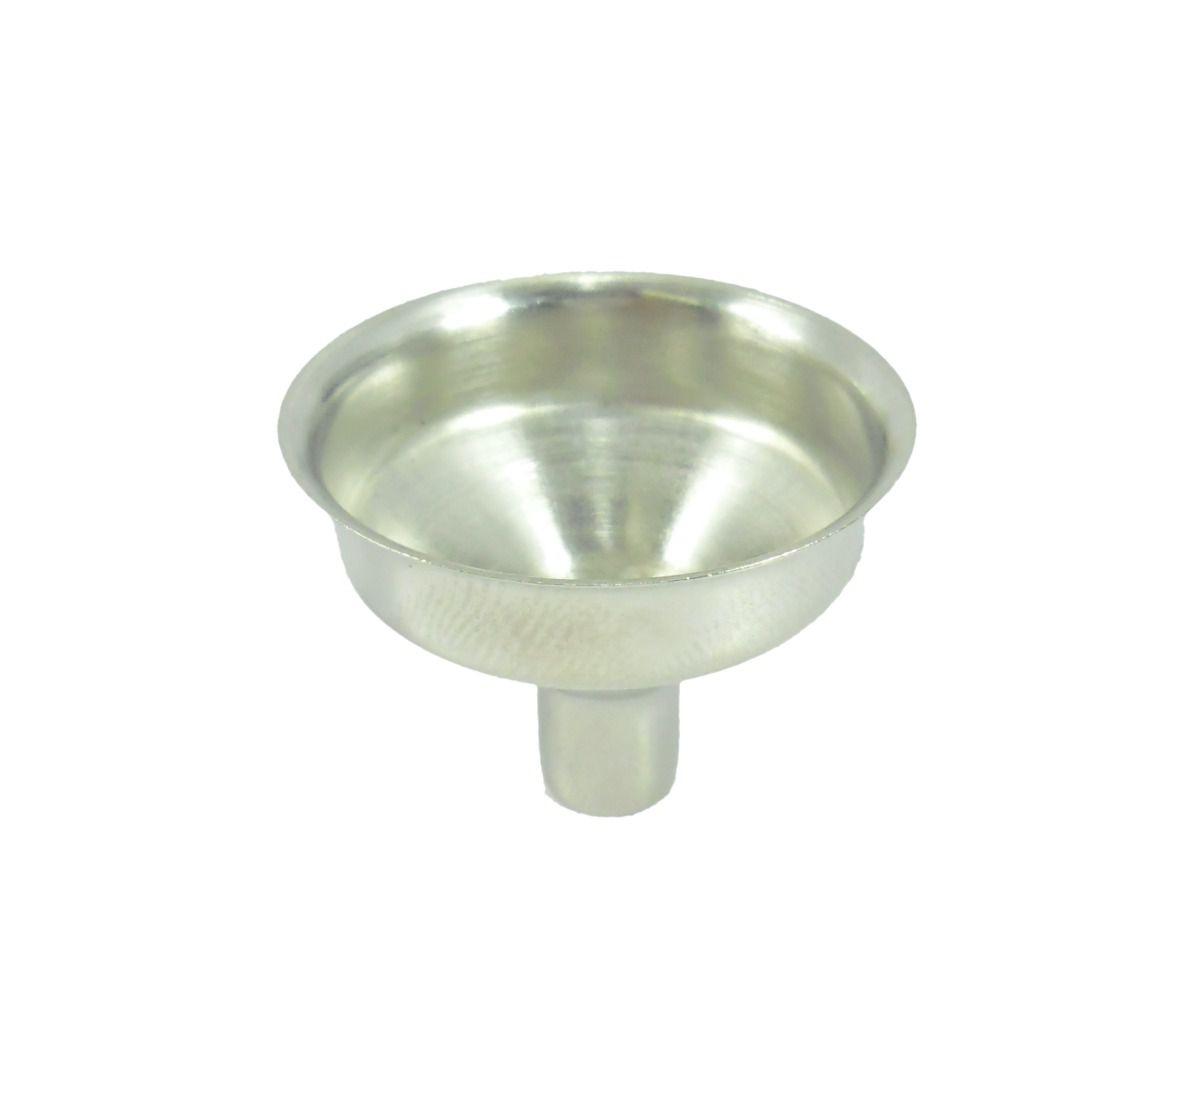 Funil para Dosador (Snuff Bullet) em alumínio